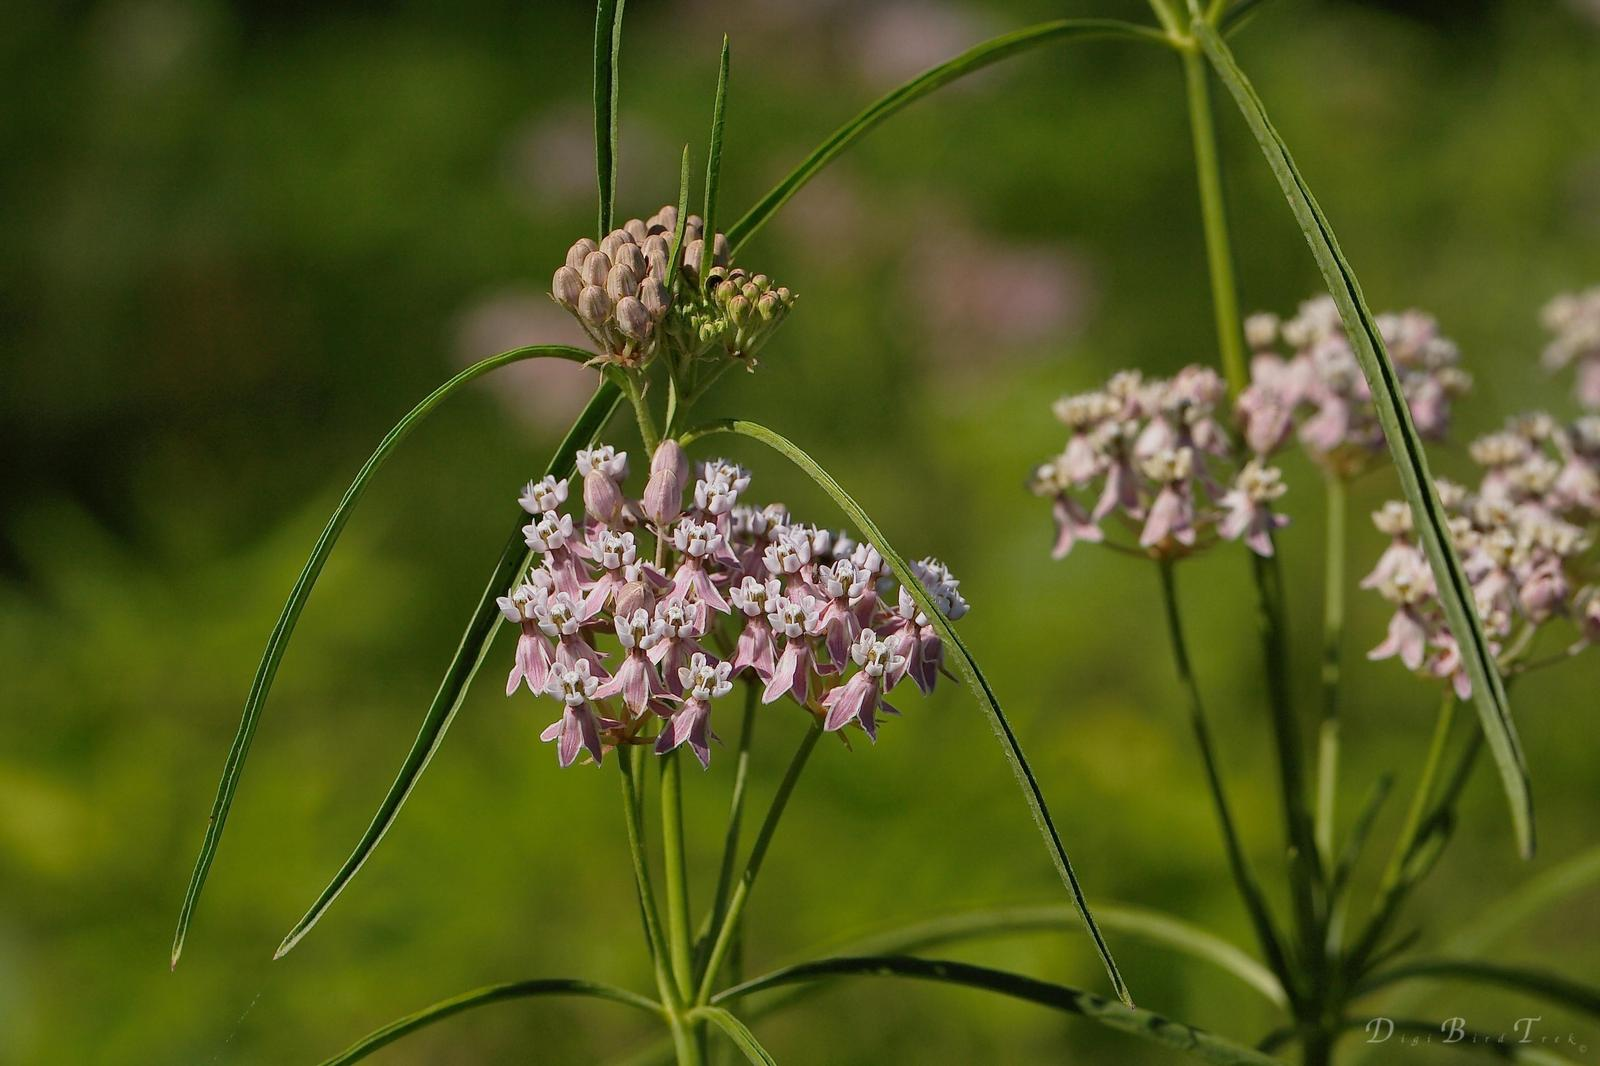 Narrow-leaved milkweed Photo by Digibirdtrek CA